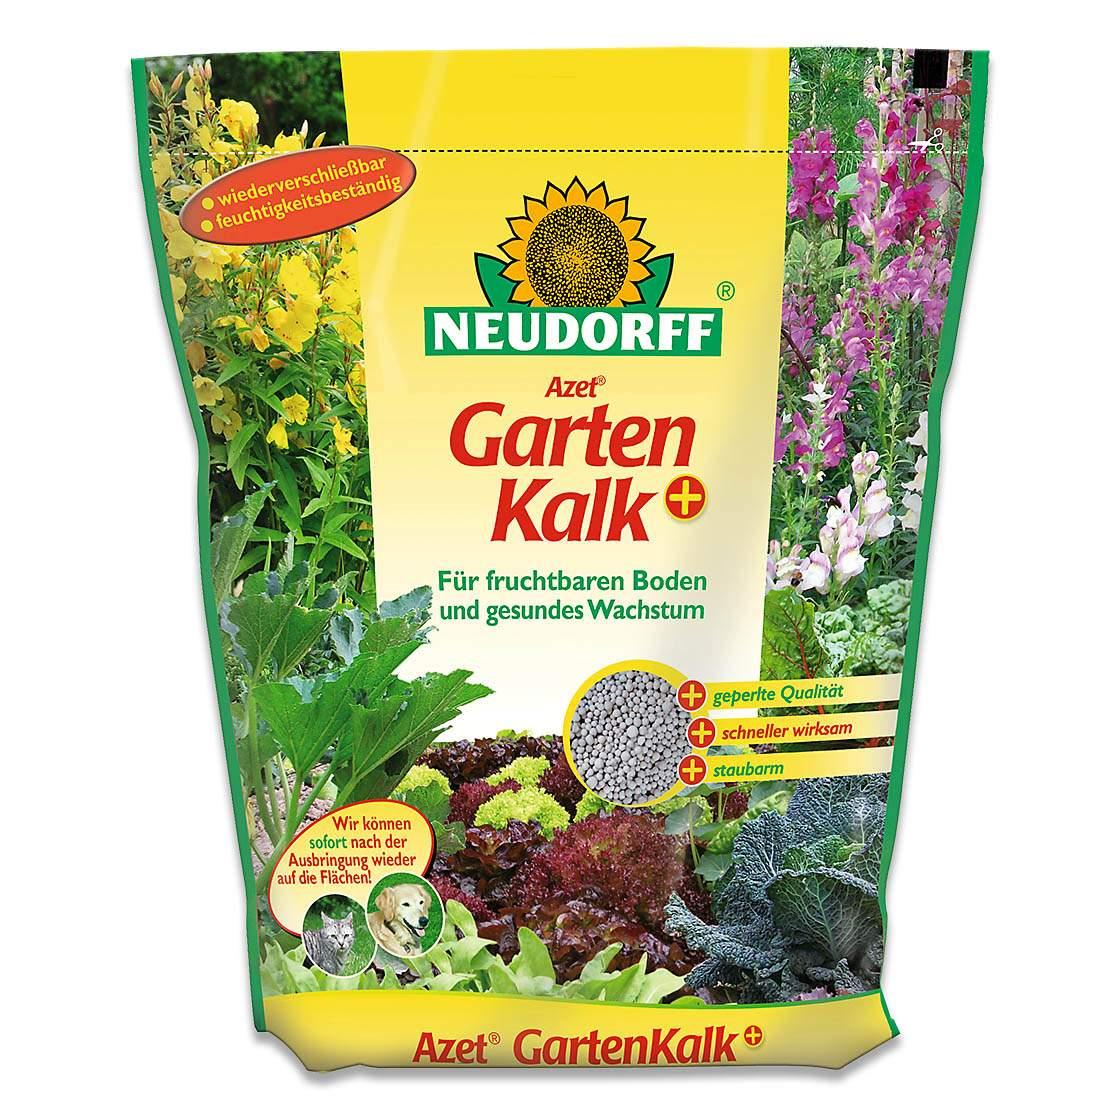 Neudorff Azet GartenKalk